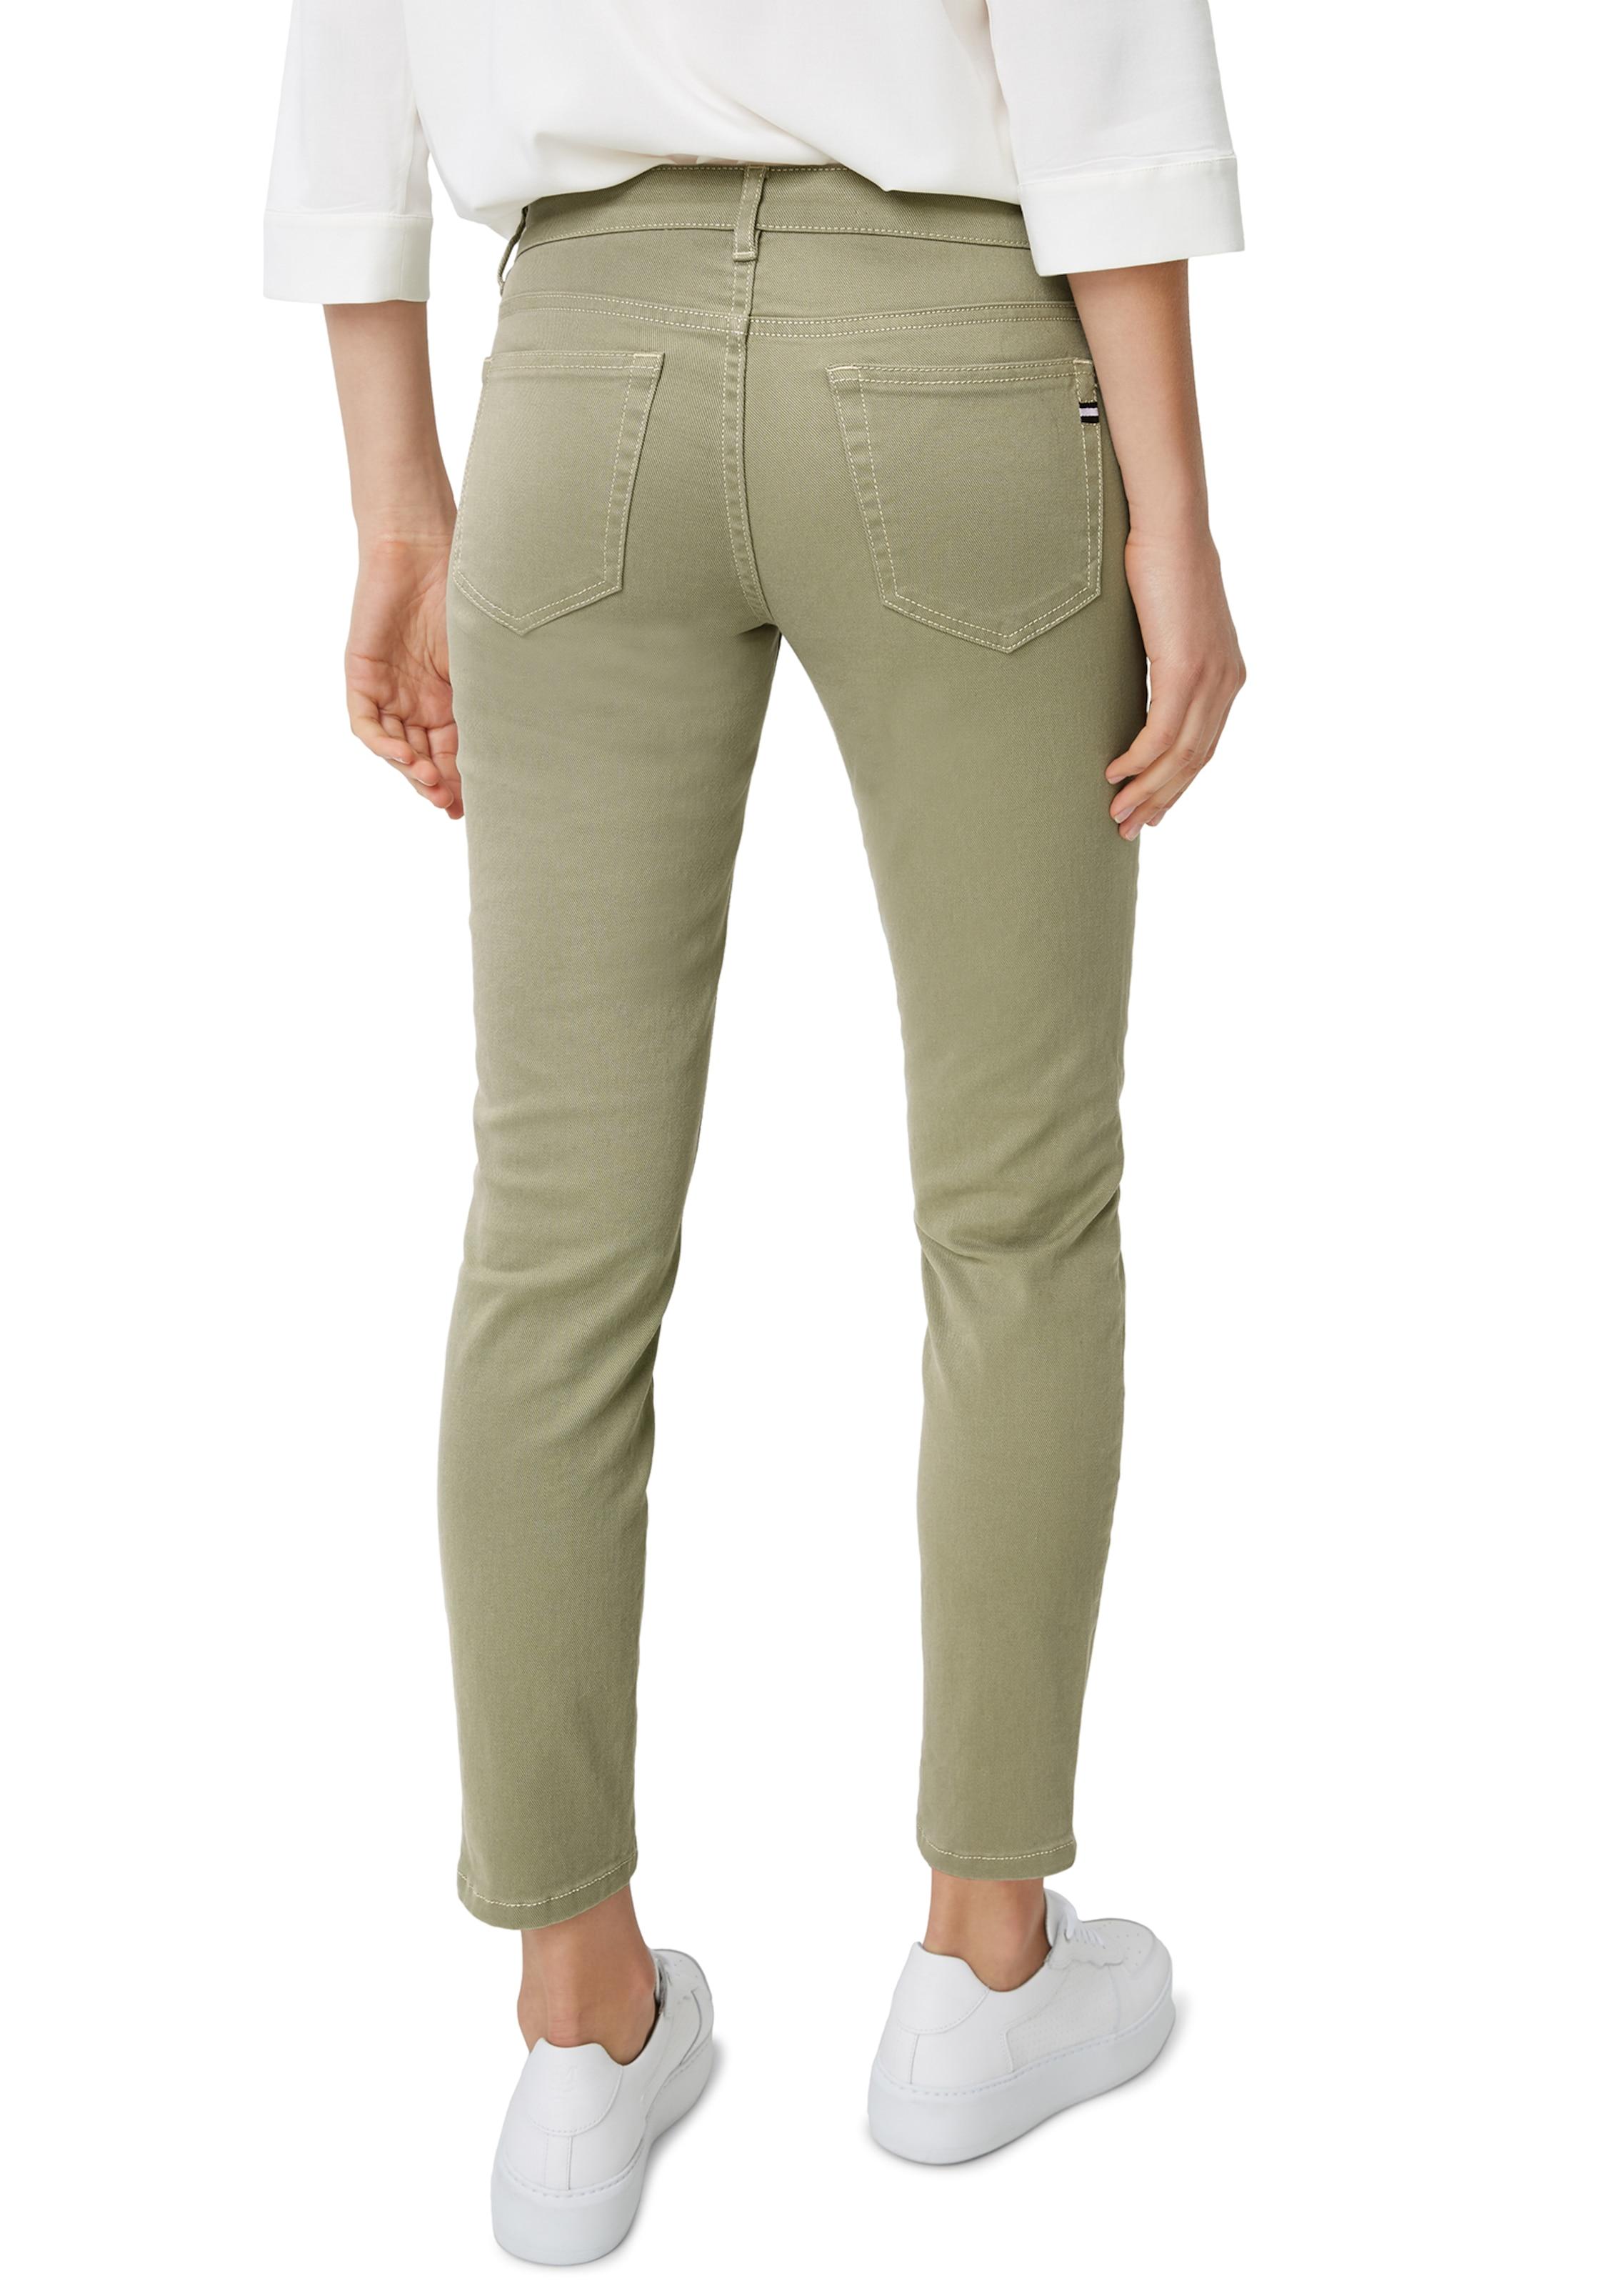 Khaki Marc O'polo 'lulea' Jeans In 8nvmw0ON